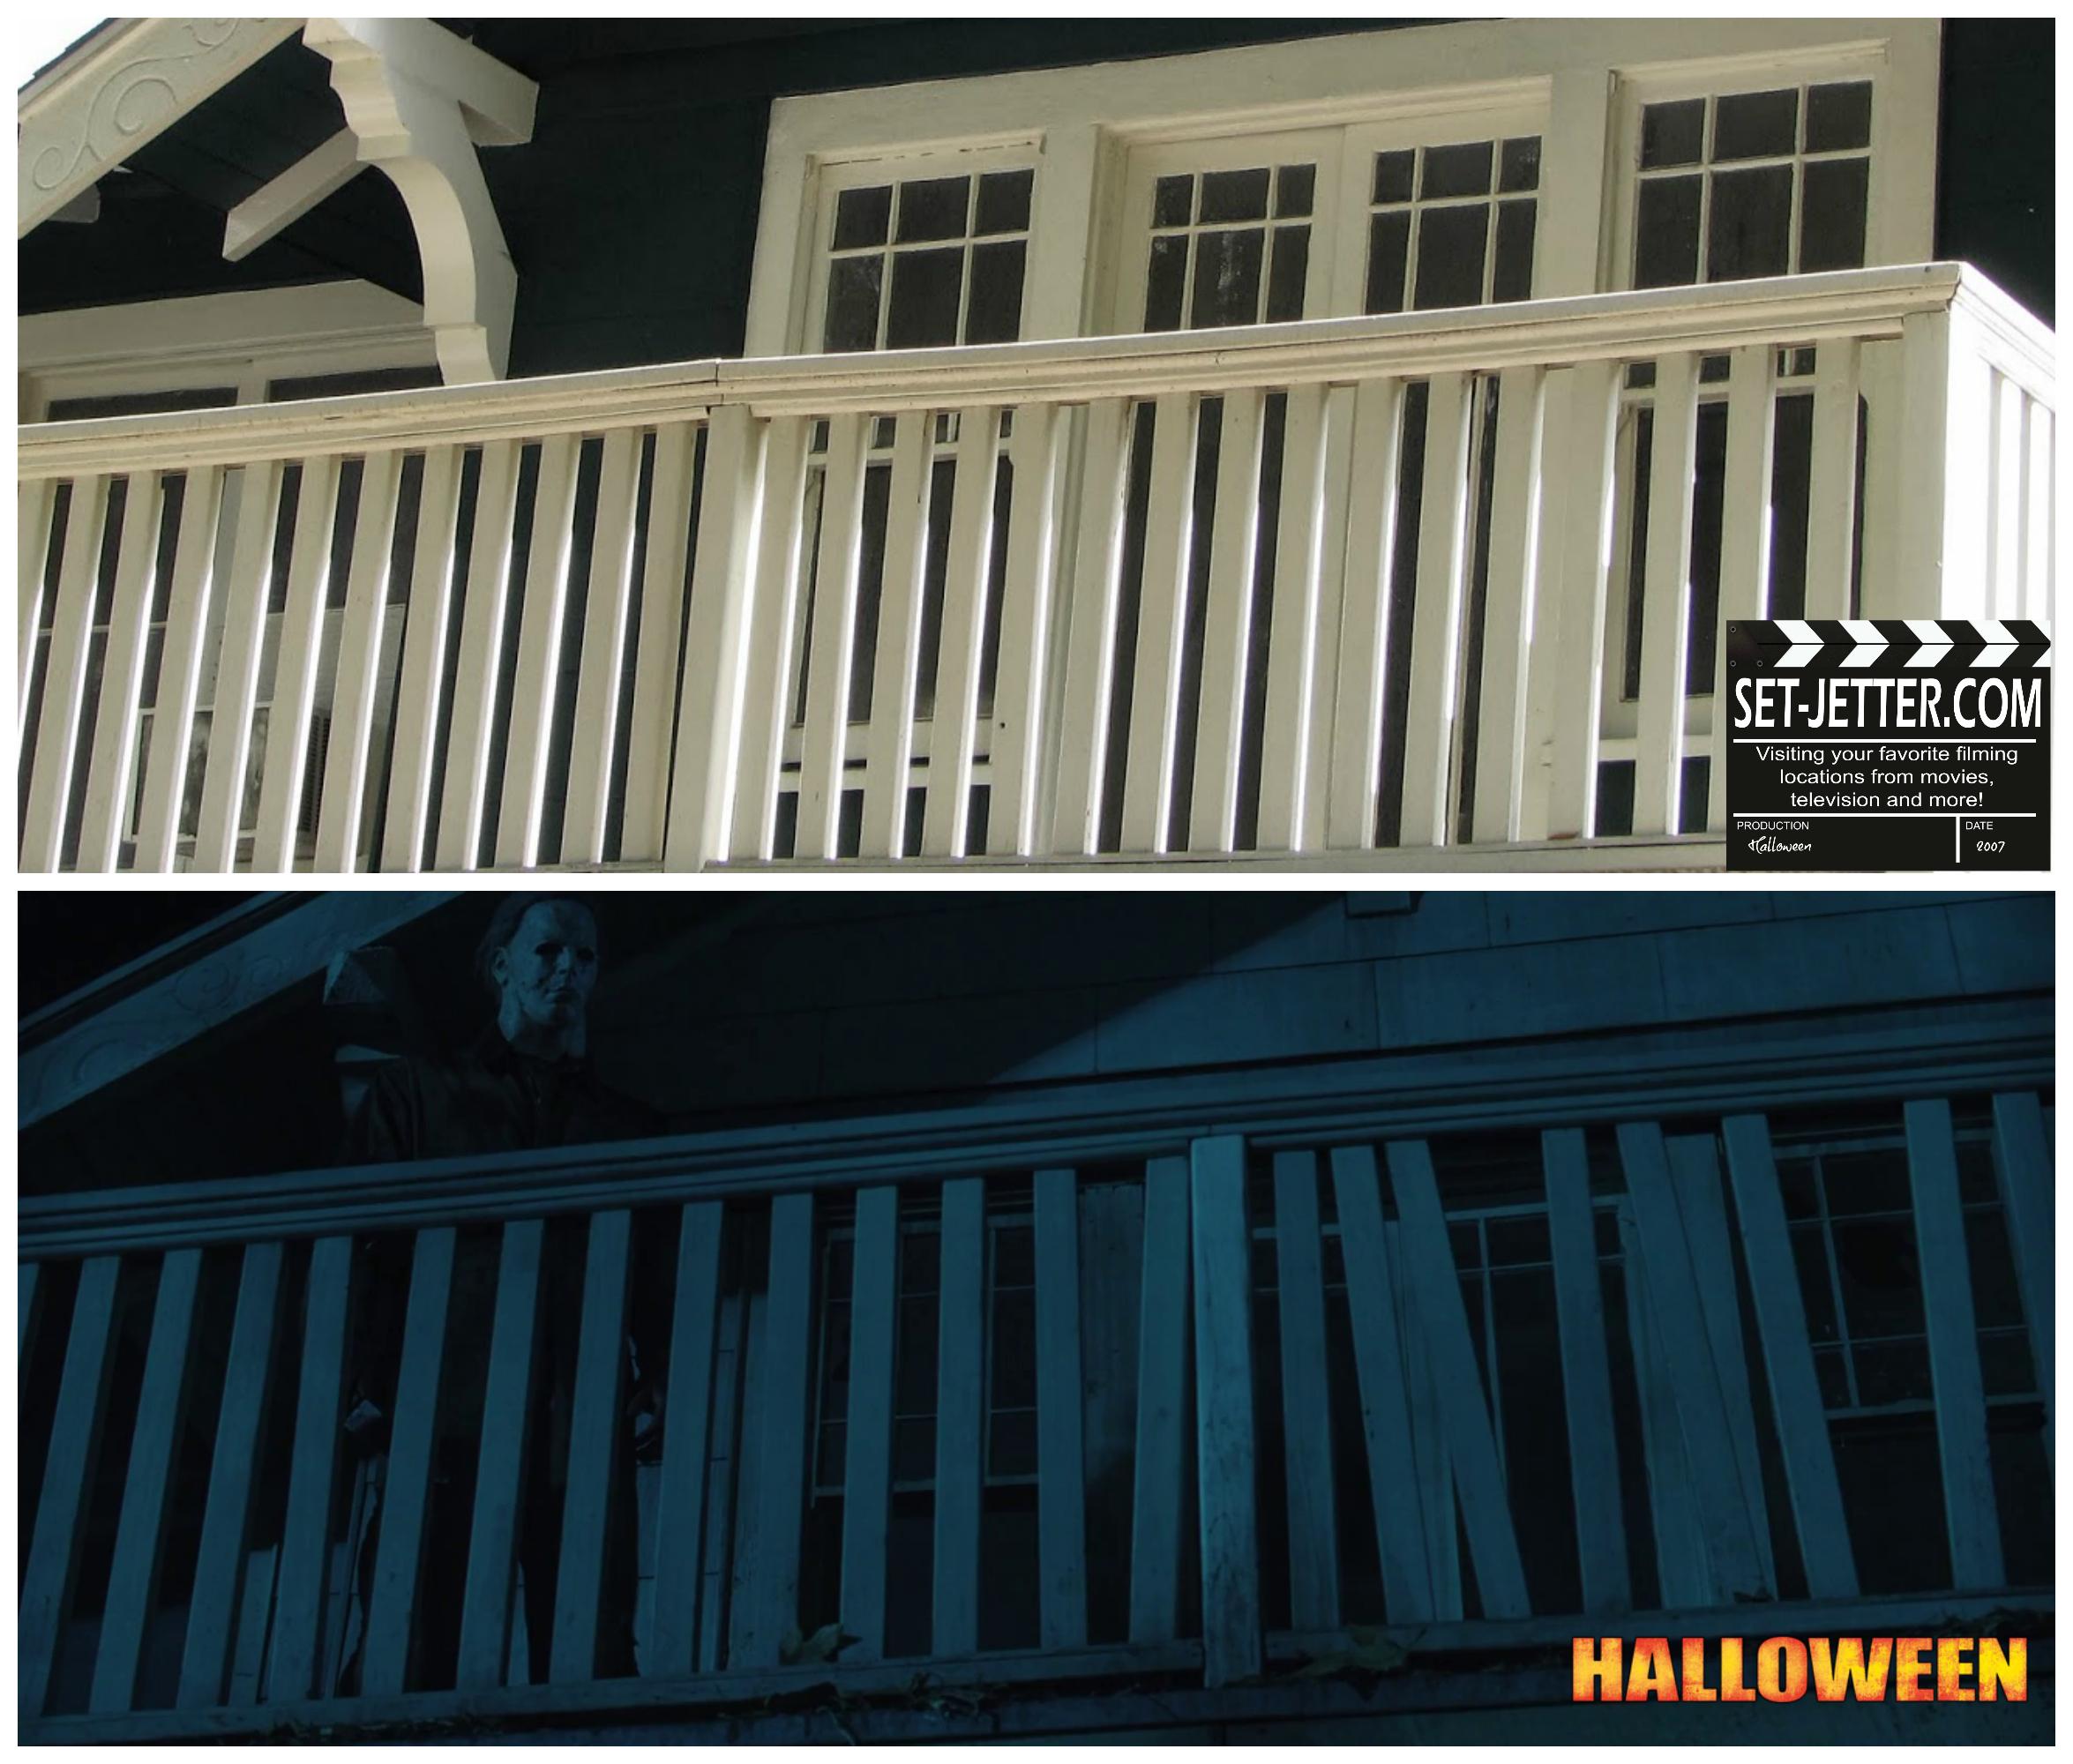 Halloween 2007 comparison 16.jpg